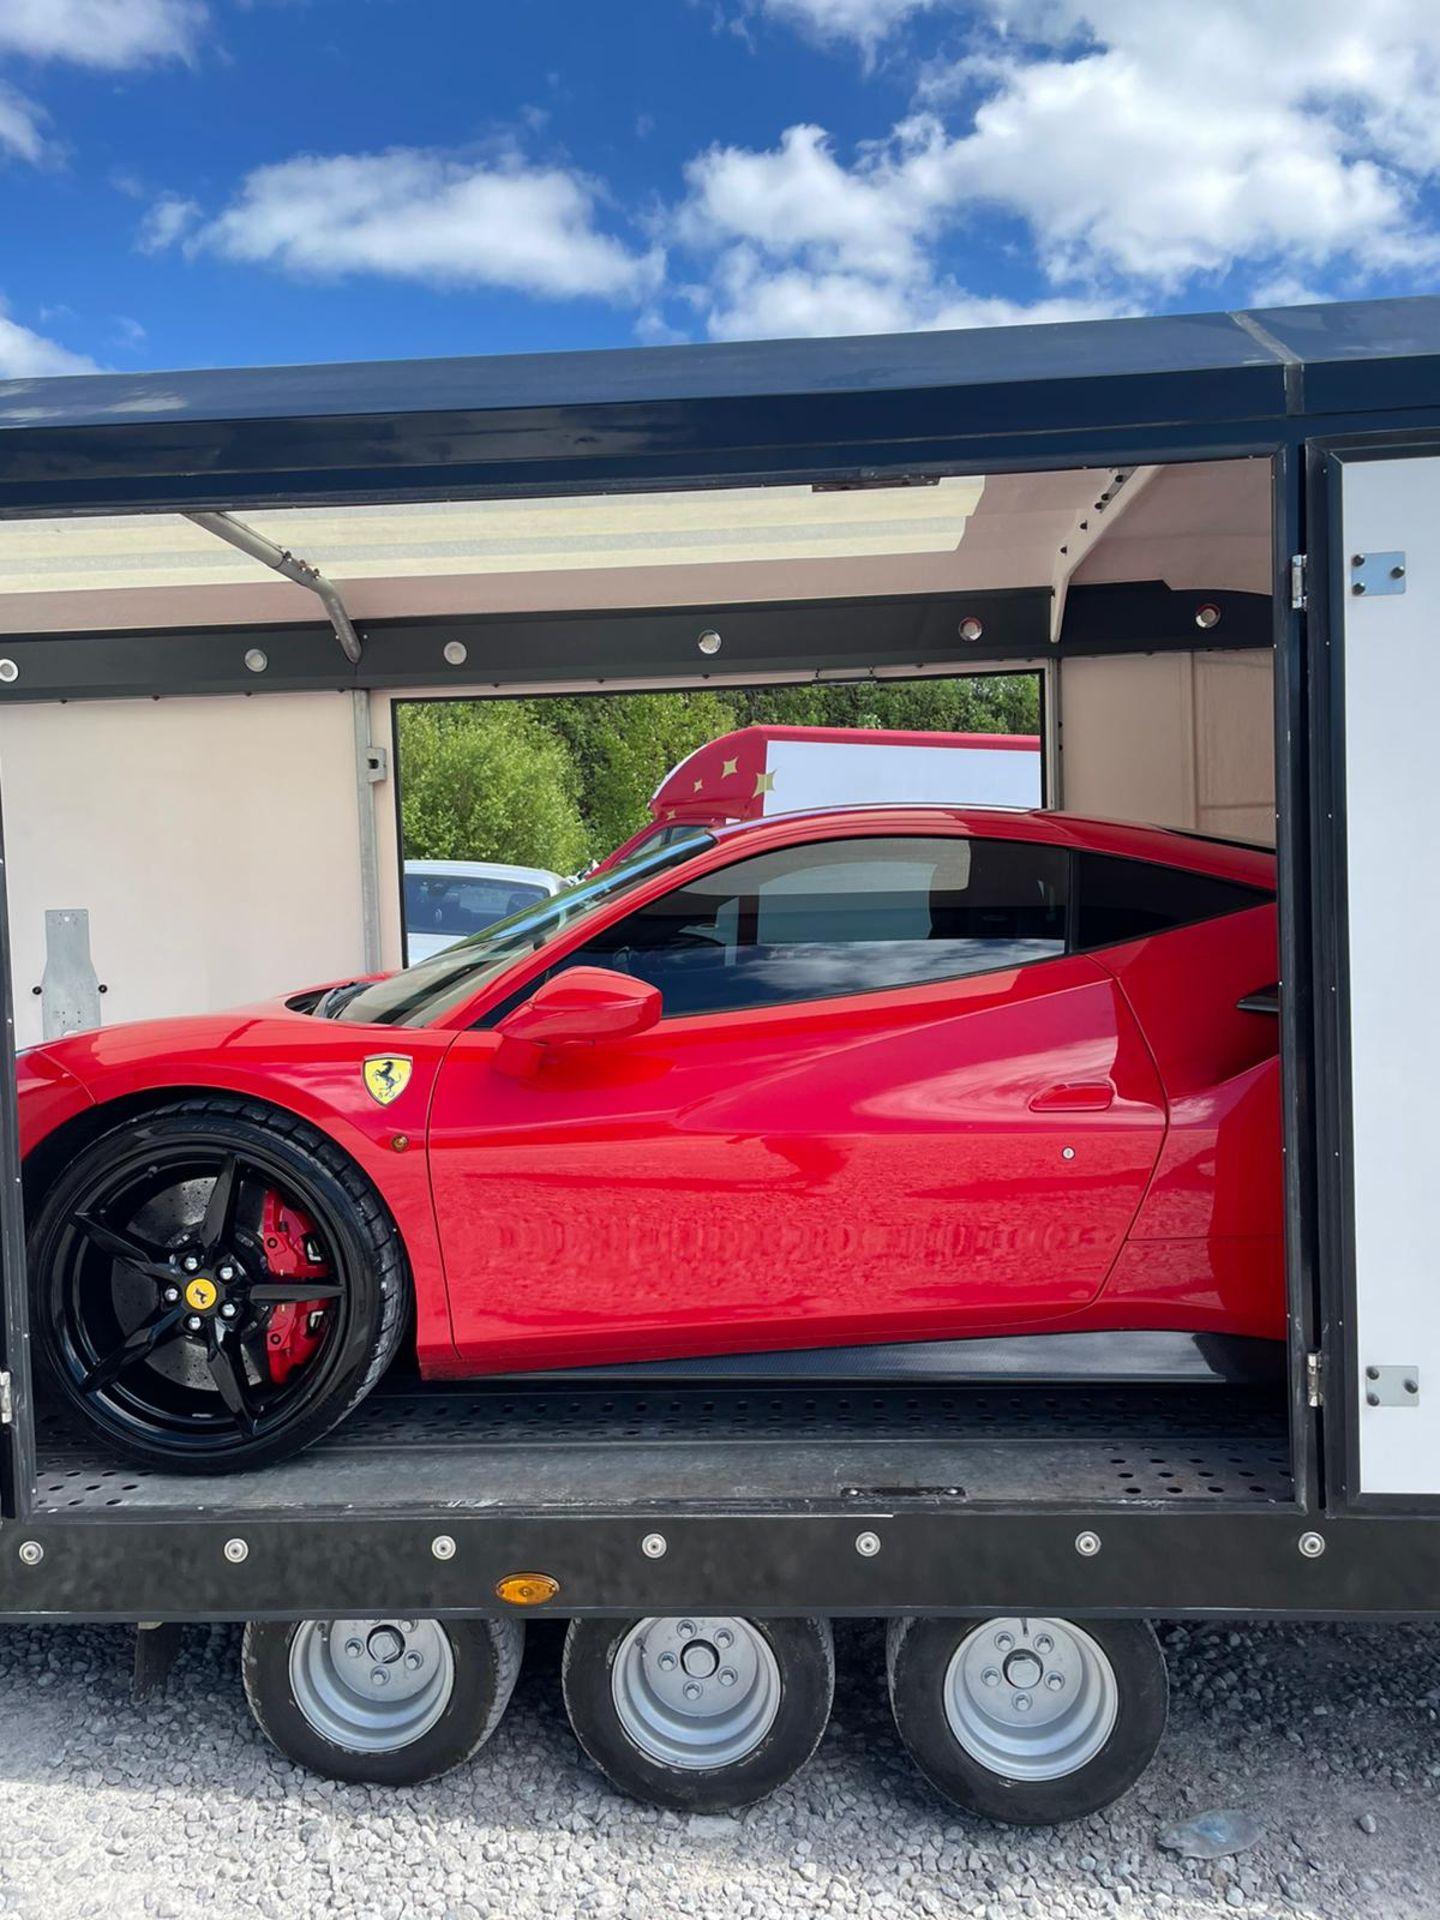 2016 FERRARI 488 GTB 2DR RED COUPE, PETROL, AUTOMATIC, 11K MILES, LEFT HAND DRIVE *NO VAT* - Image 8 of 22